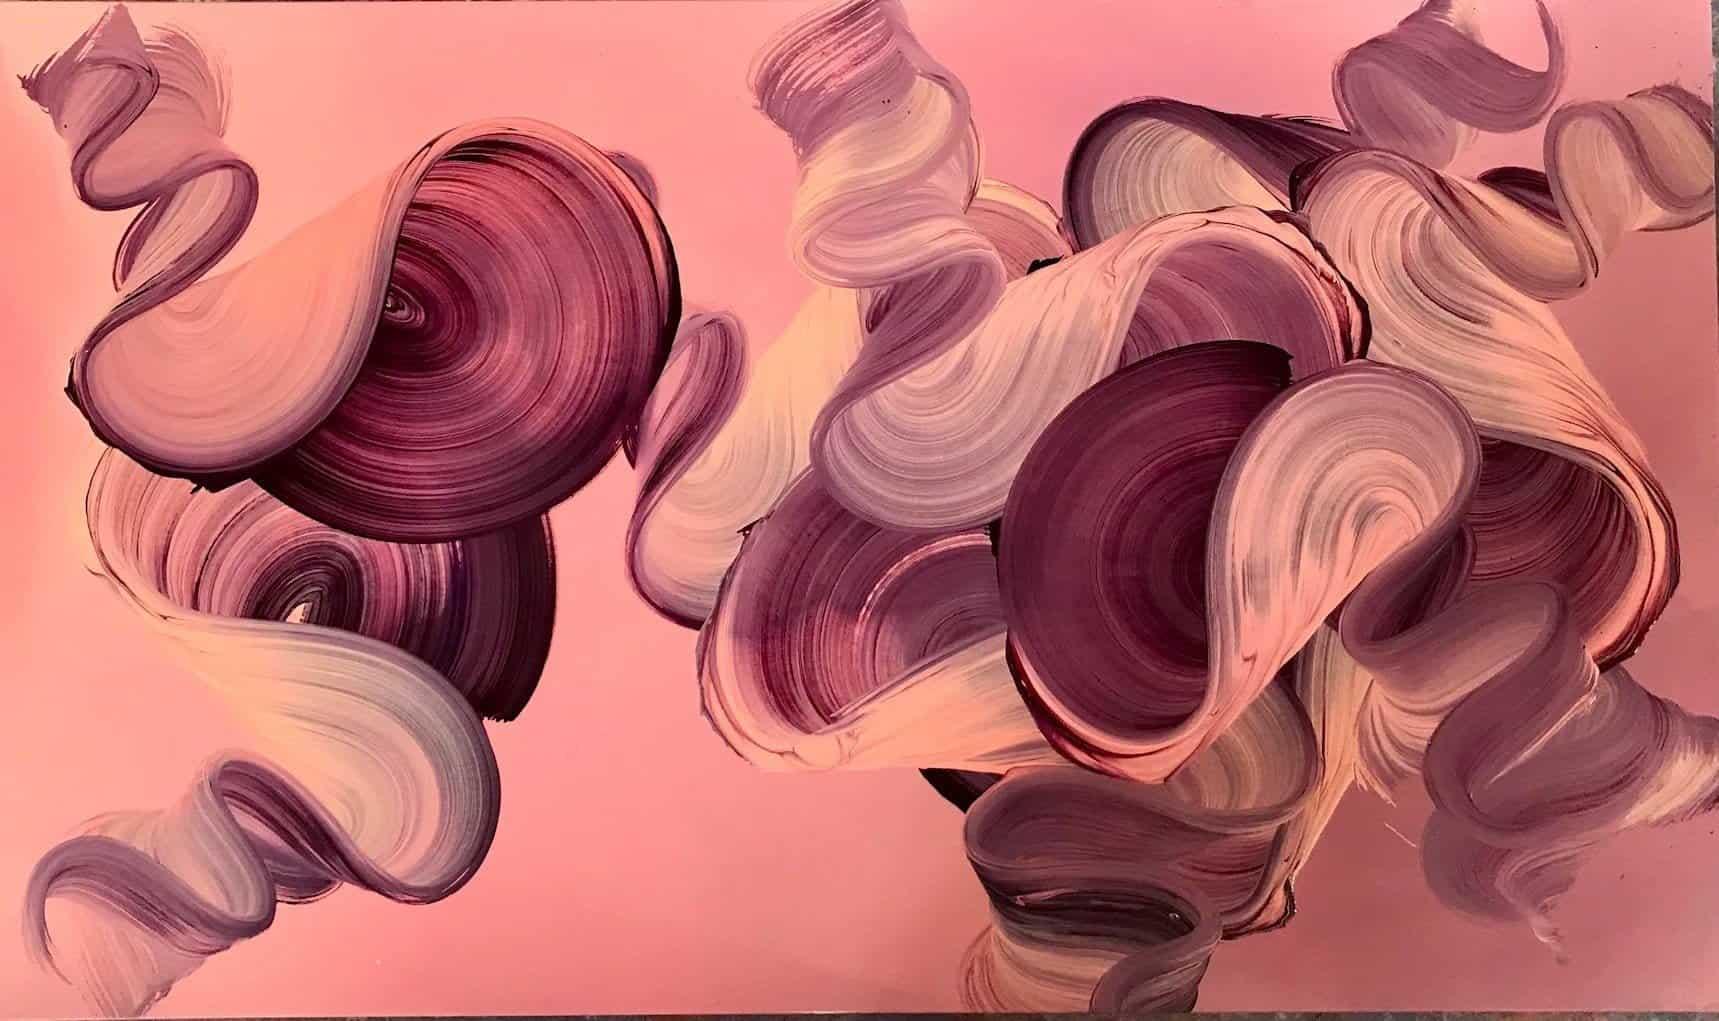 Werk van Dragica Carlin